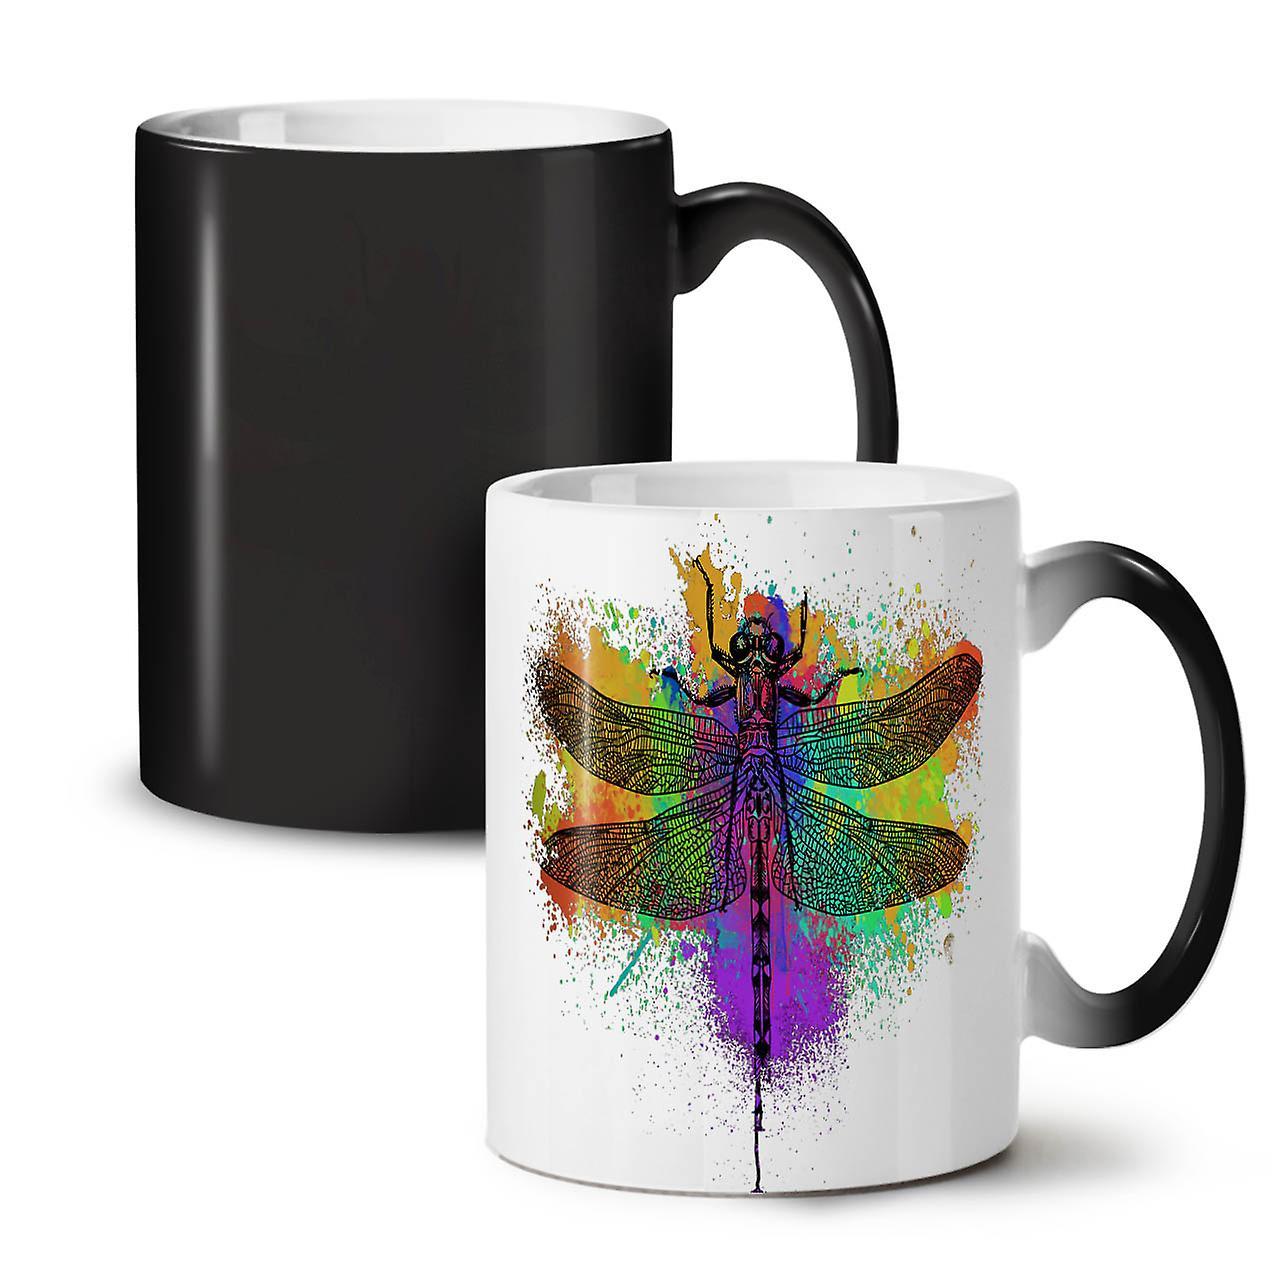 Black Mug OzWellcoda Animal Tea Colour Ceramic Insect 11 Coffee Changing Colorful New LMGSzVqUp